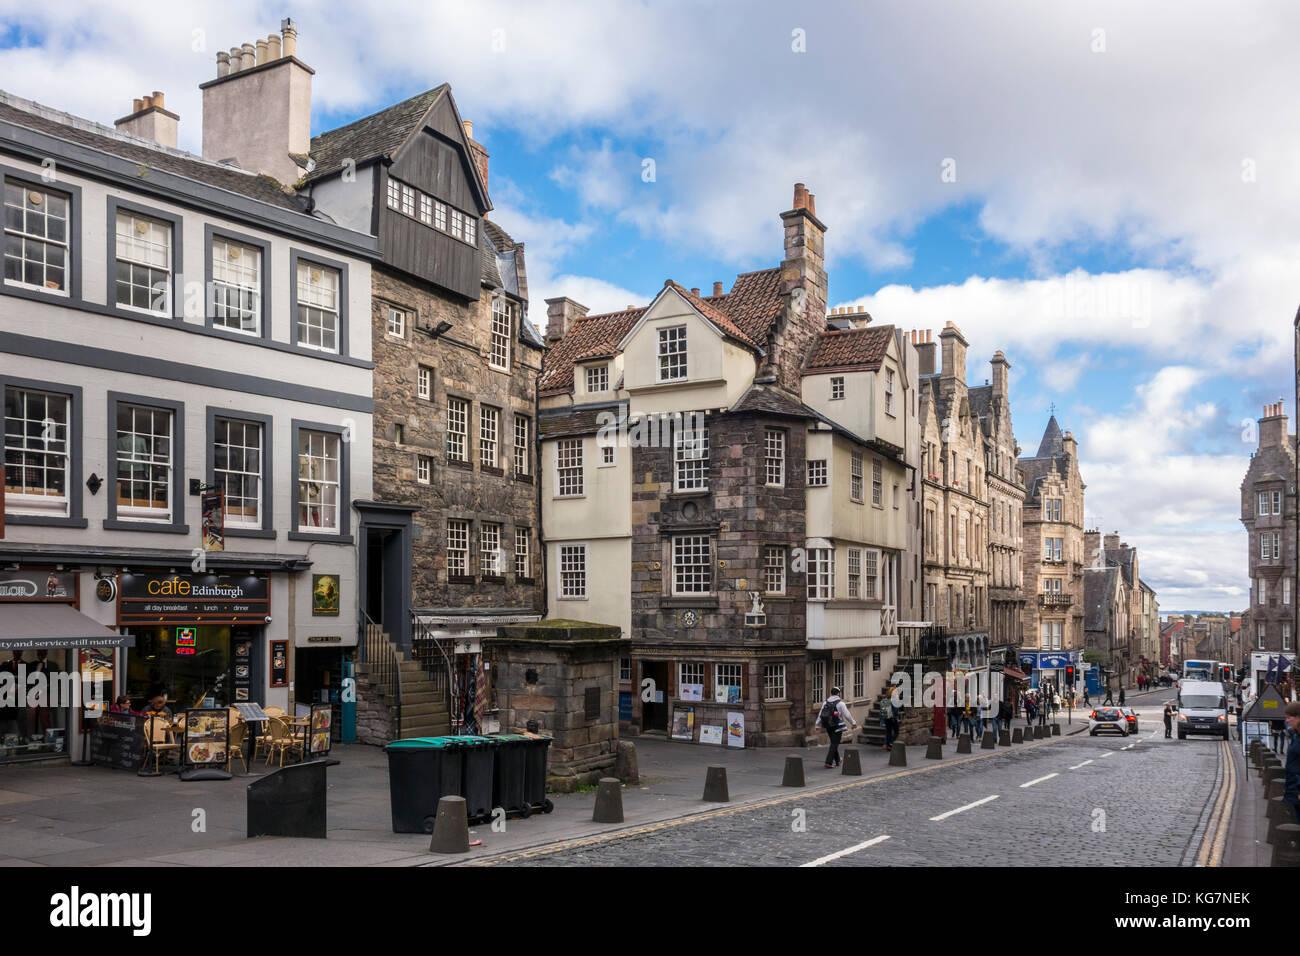 John Knox House, John Knox's House, historic 16th century house, High Street, Edinburgh, Scotland, UK Stock Photo